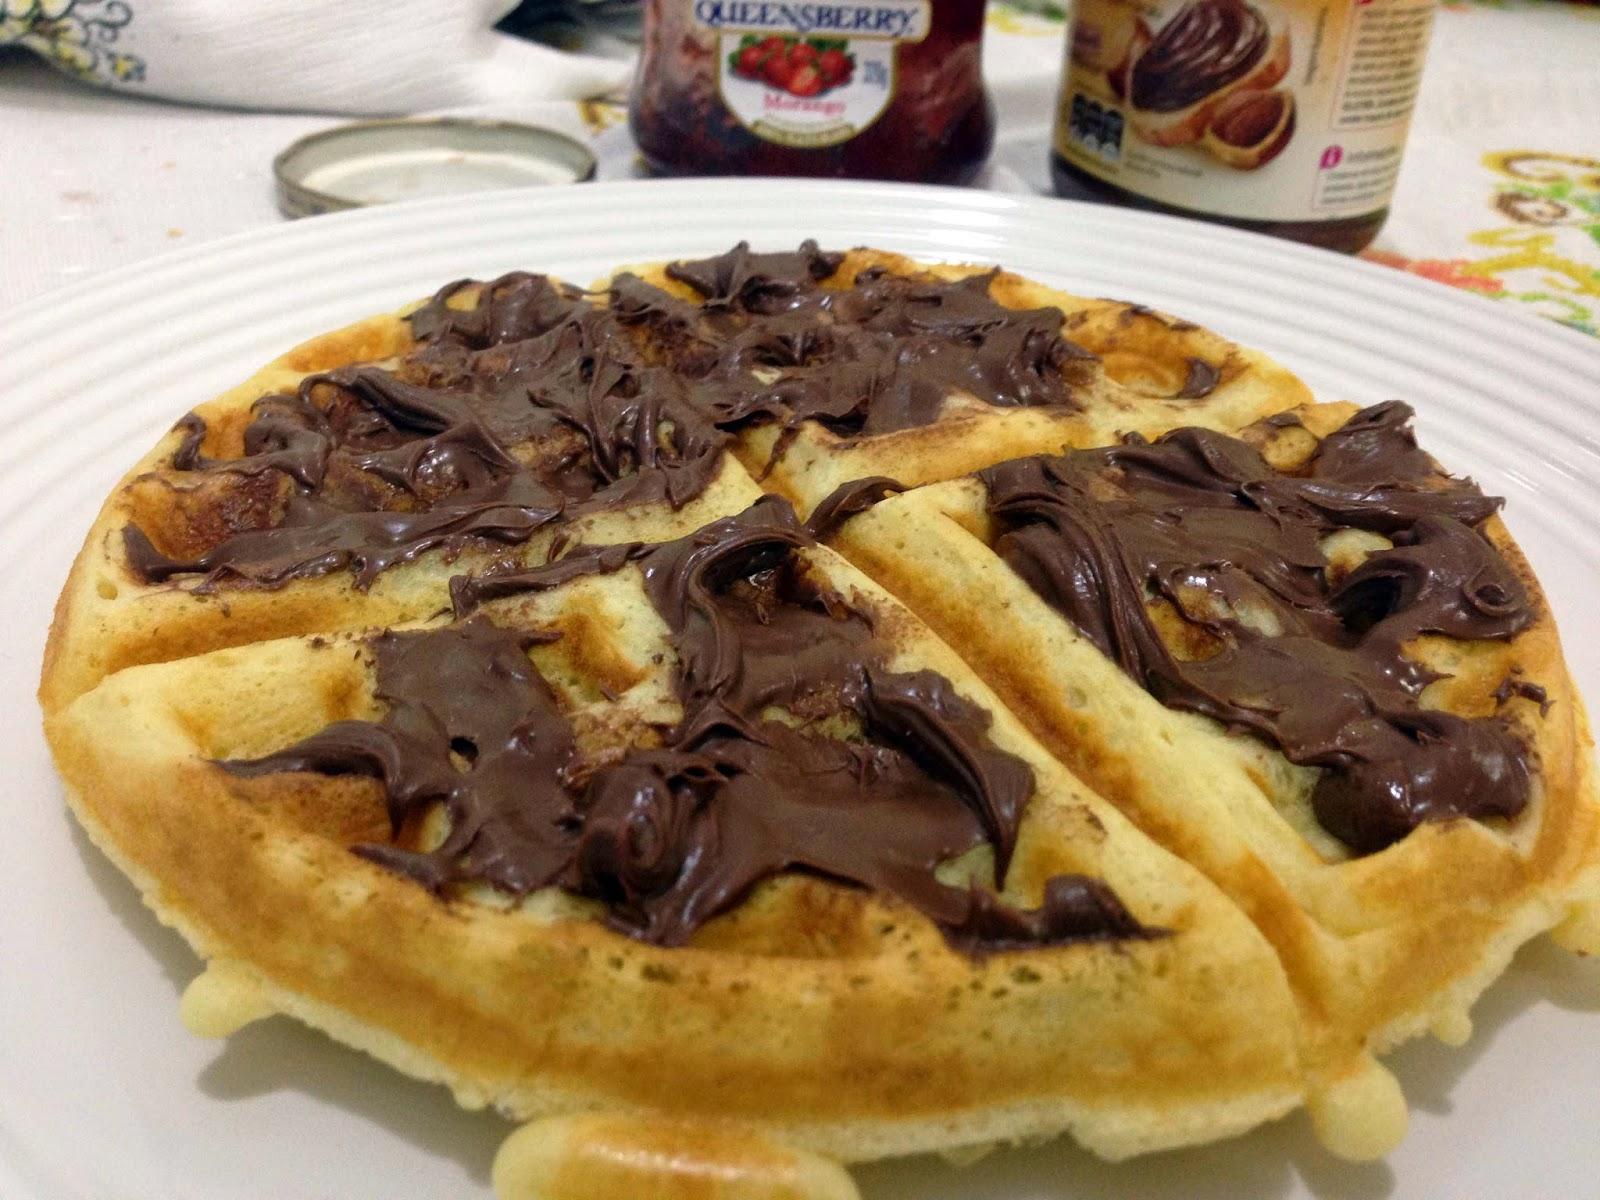 A Máquina de waffle redonda e a receita do waffle perfeito